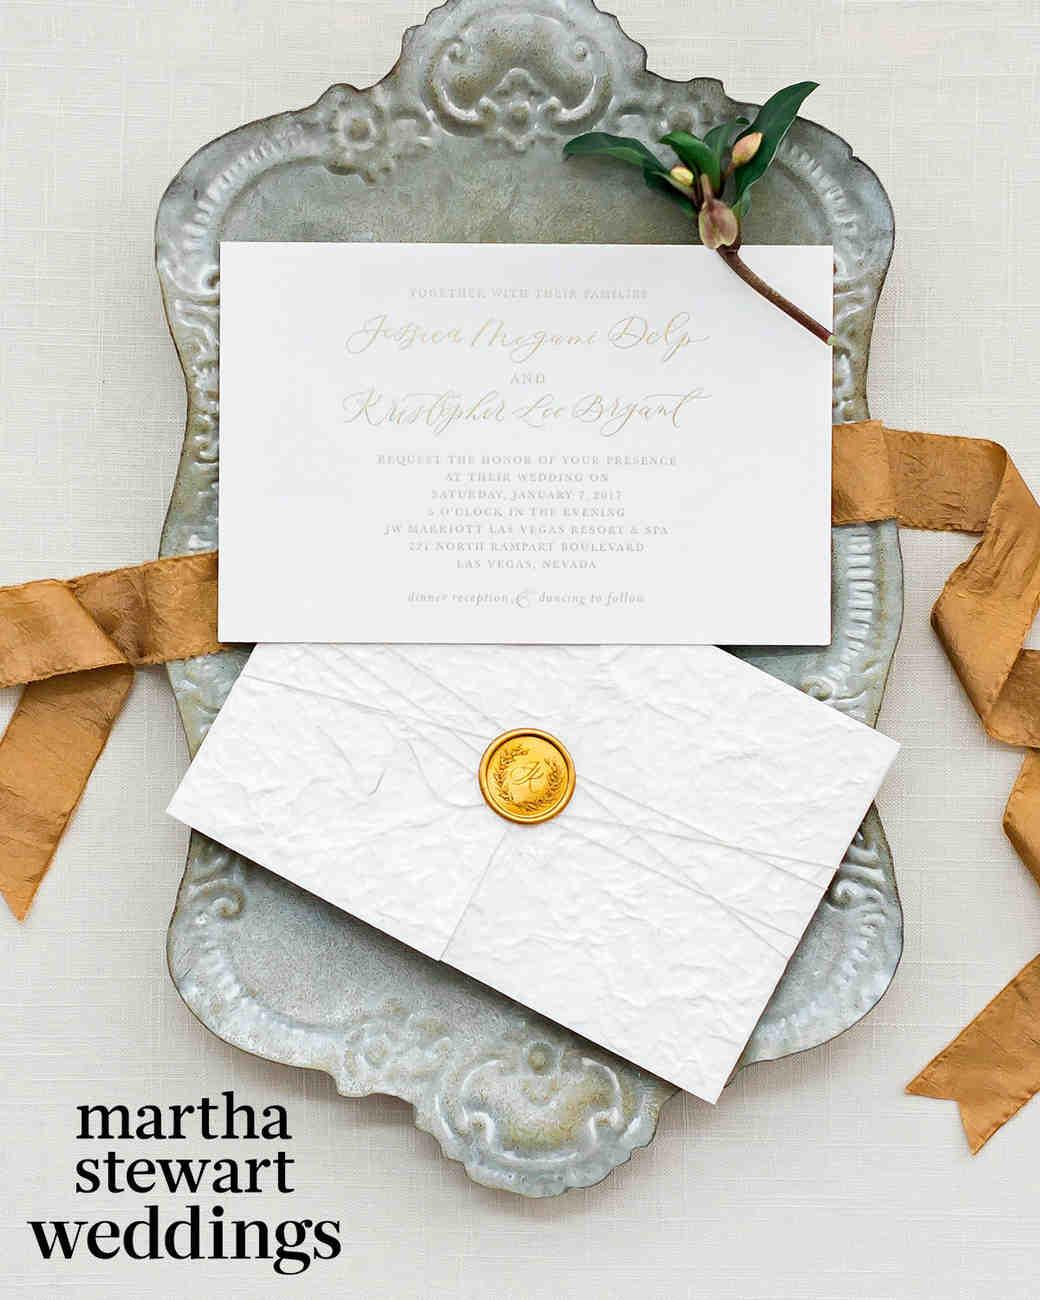 jessica and kris bryant wedding invitation